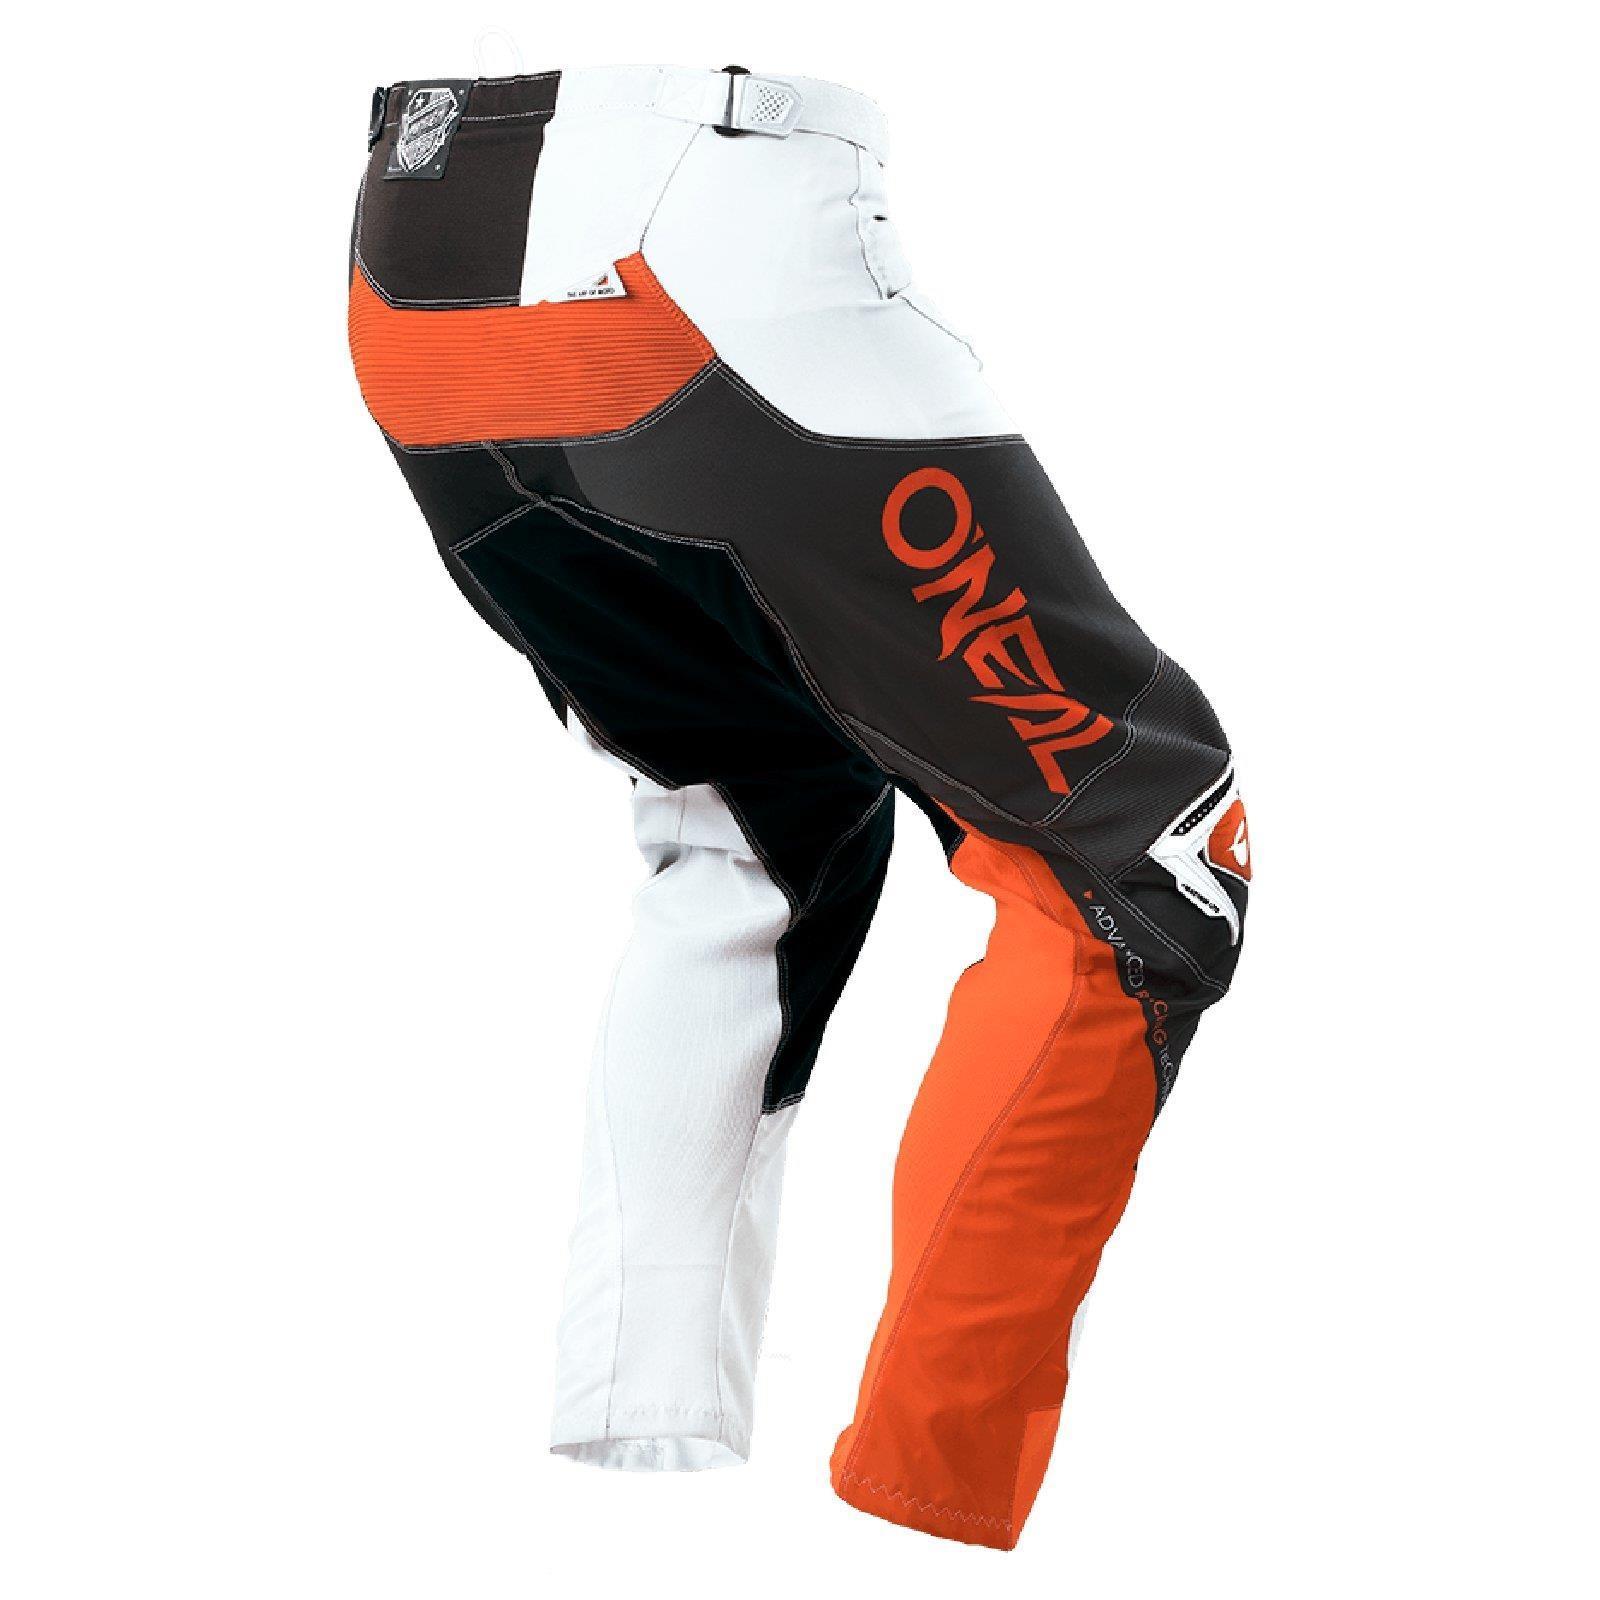 Bicicleta-de-montana-Enduro-MTB-downhill-pantalones-los-pantalones-oNeal-mayhem-que-Lite-split-Moto miniatura 13